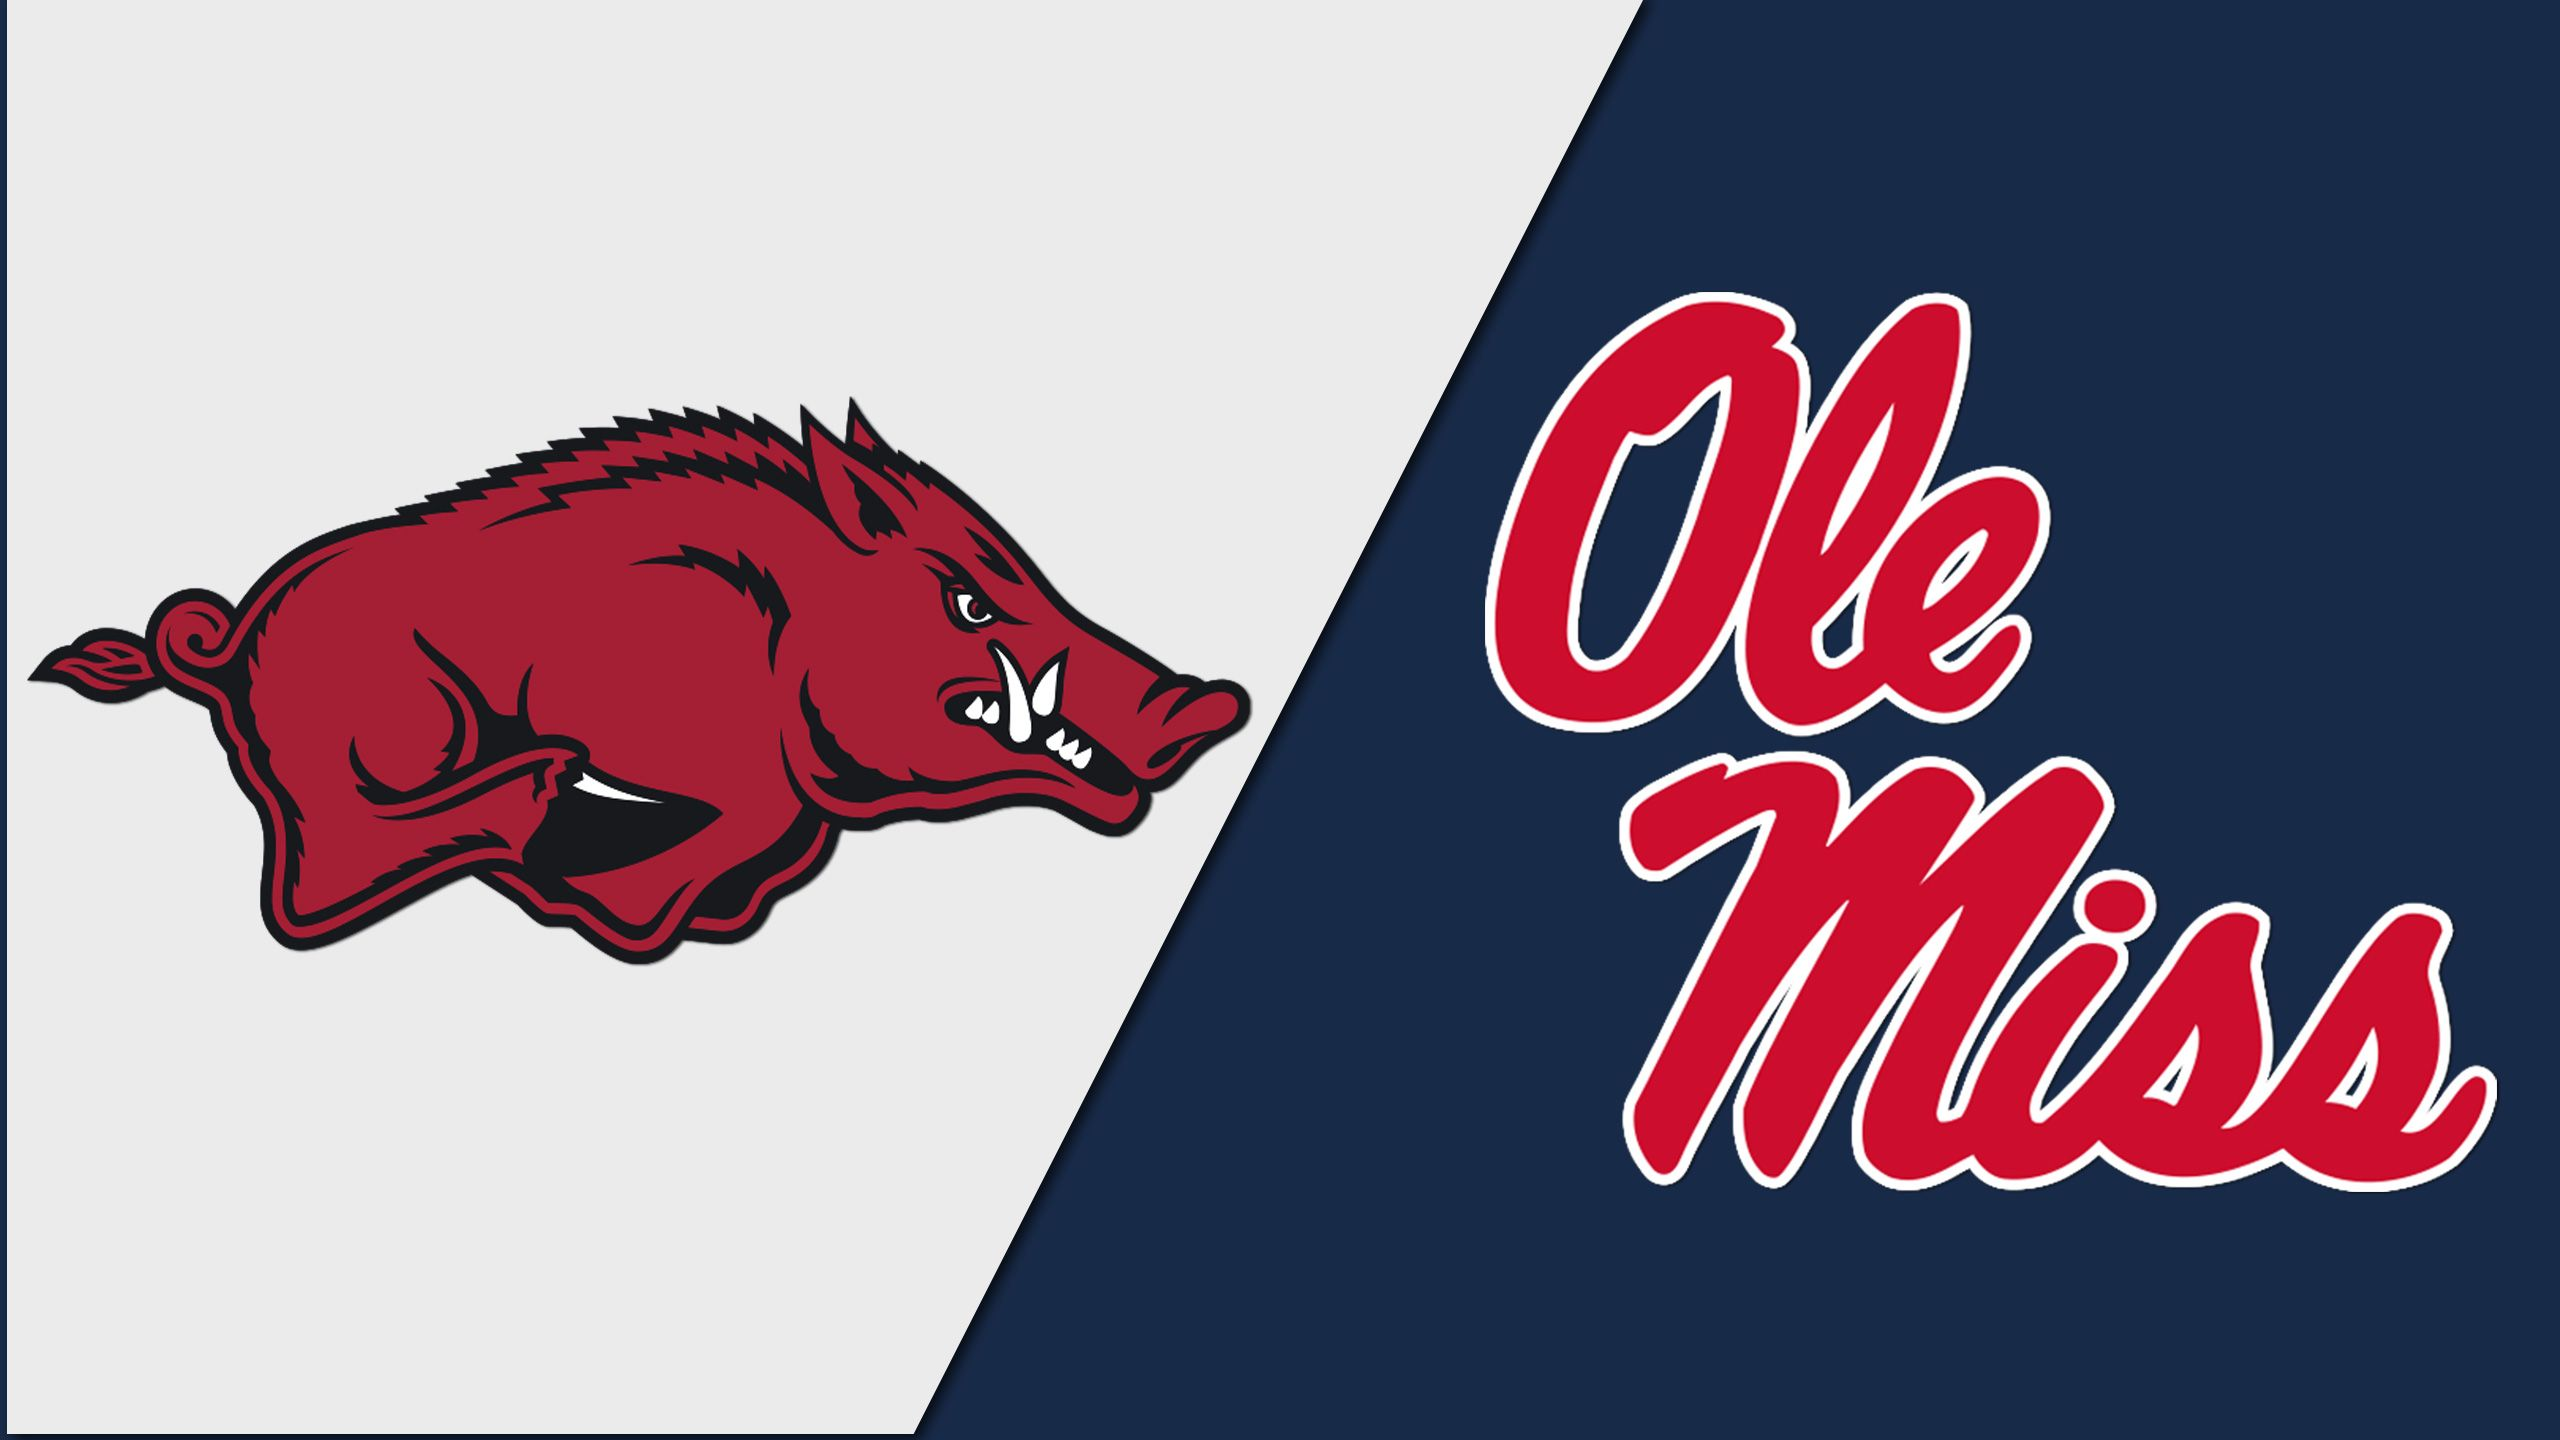 #6 Arkansas vs. #4 Ole Miss (Baseball)